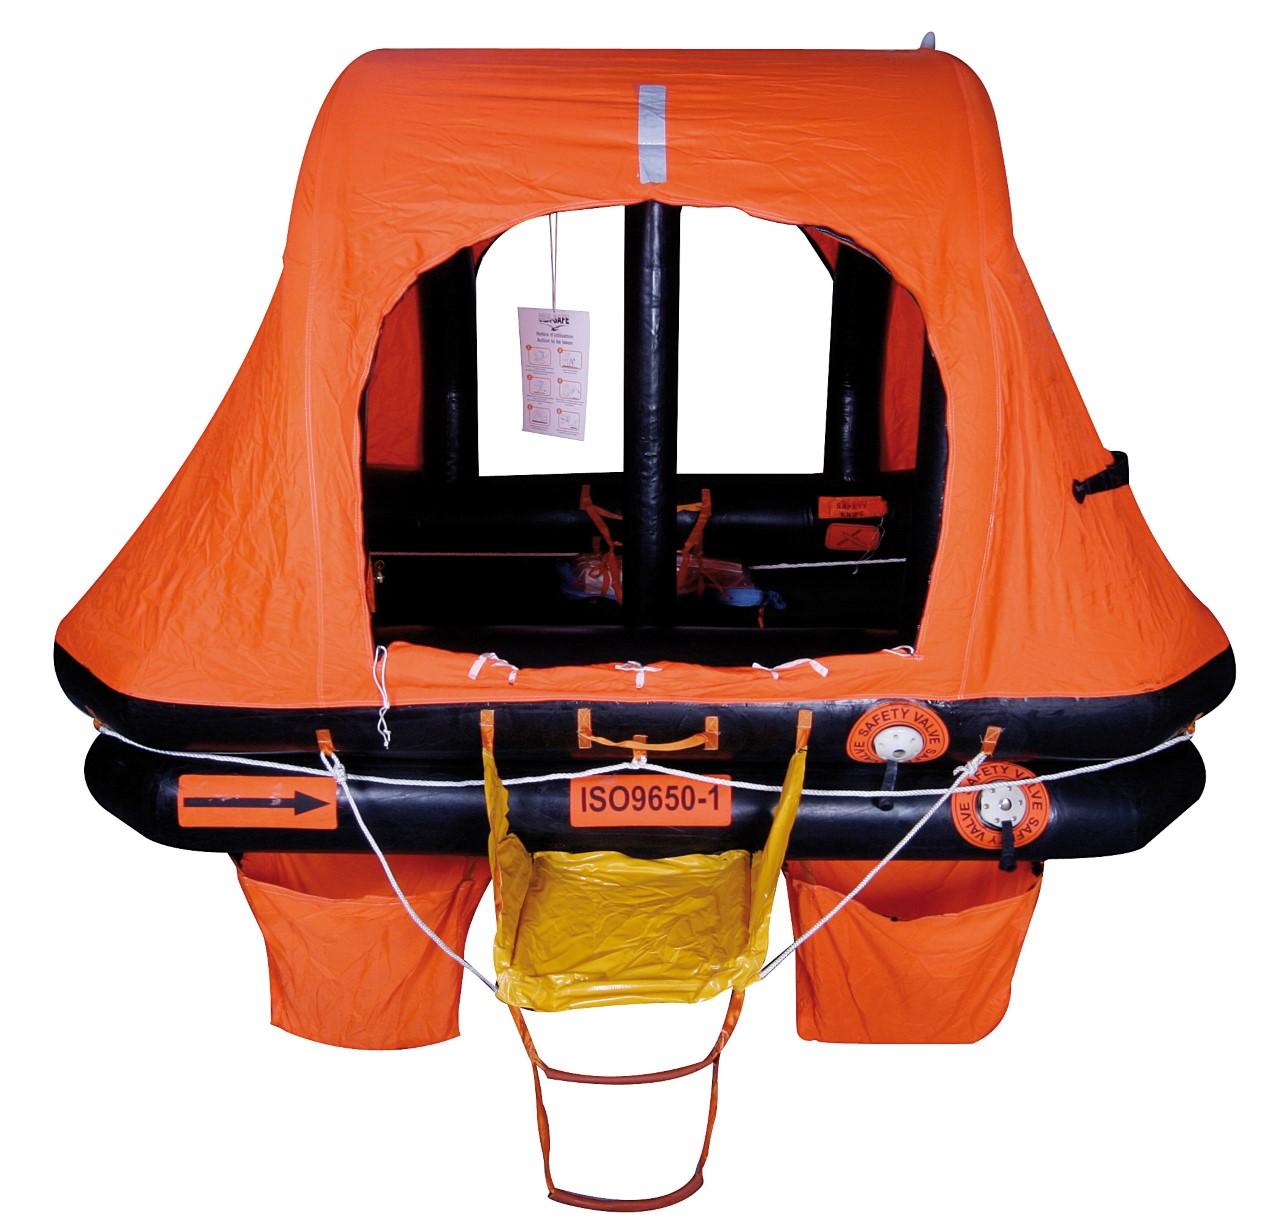 6 Person Sea-Safe KHY ISO 9650 Self Righting Liferaft 24 Hr/ SOLAS B